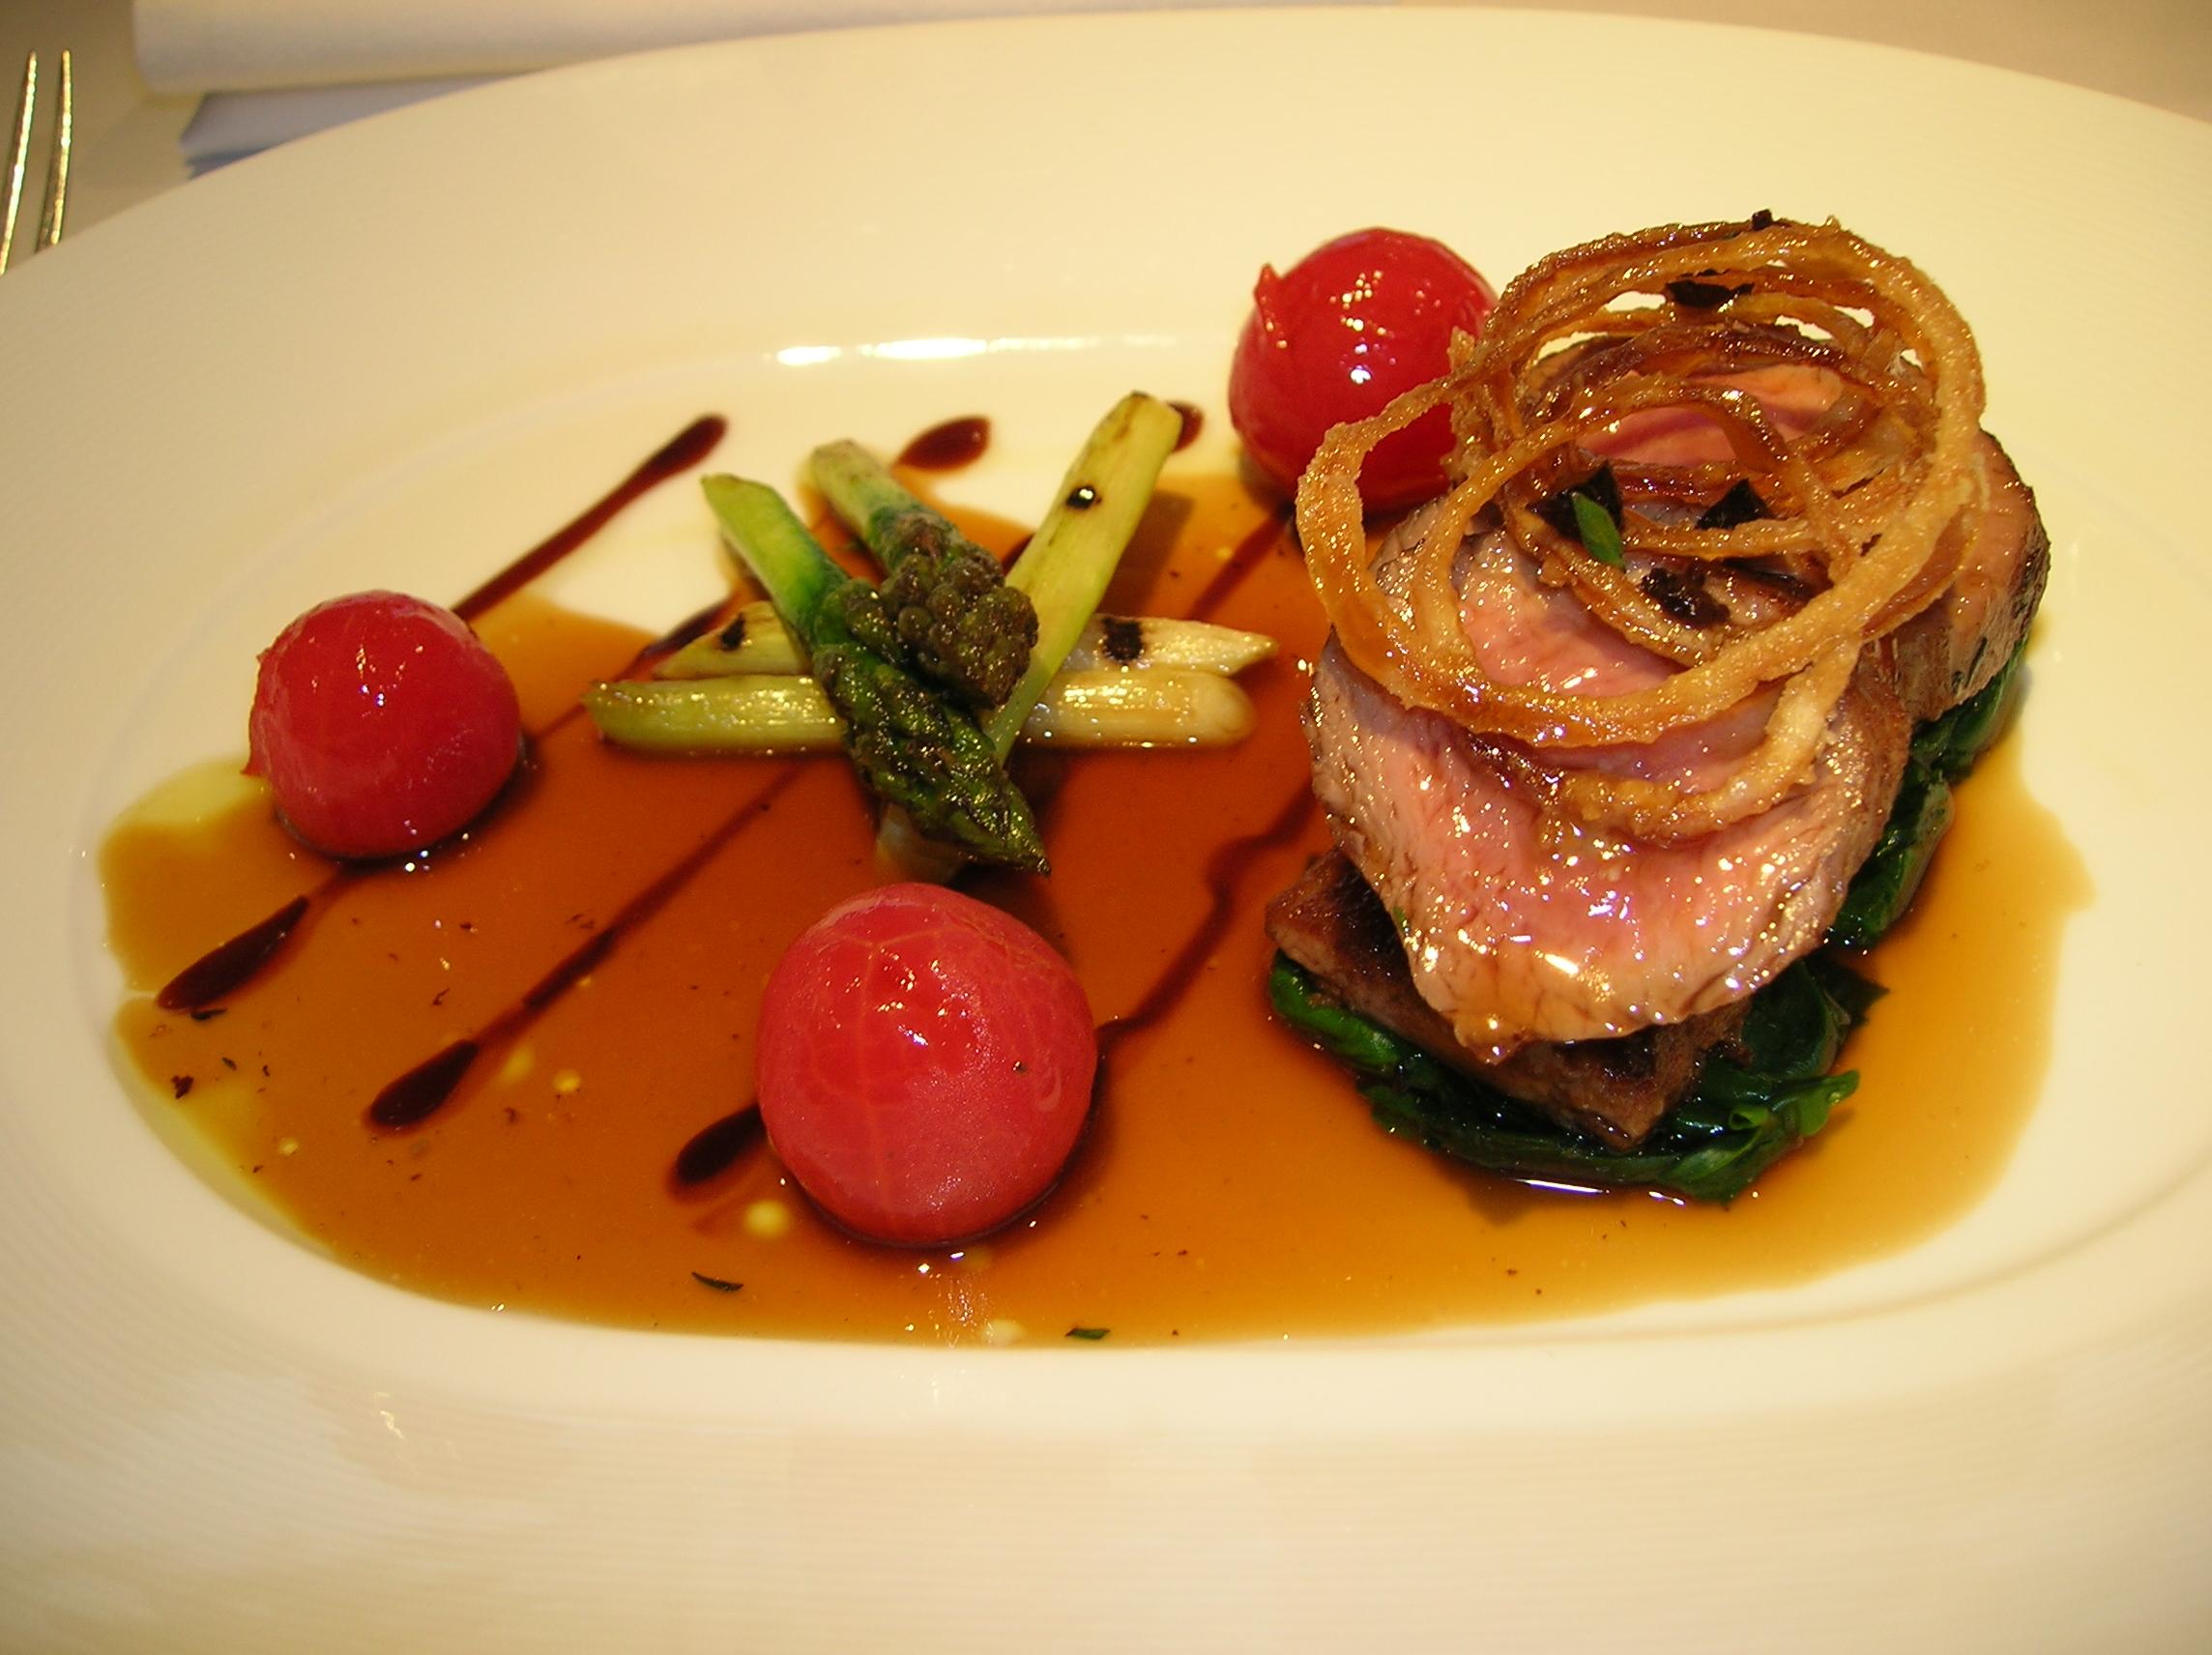 Restaurant Gordon Ramsay New York Menu